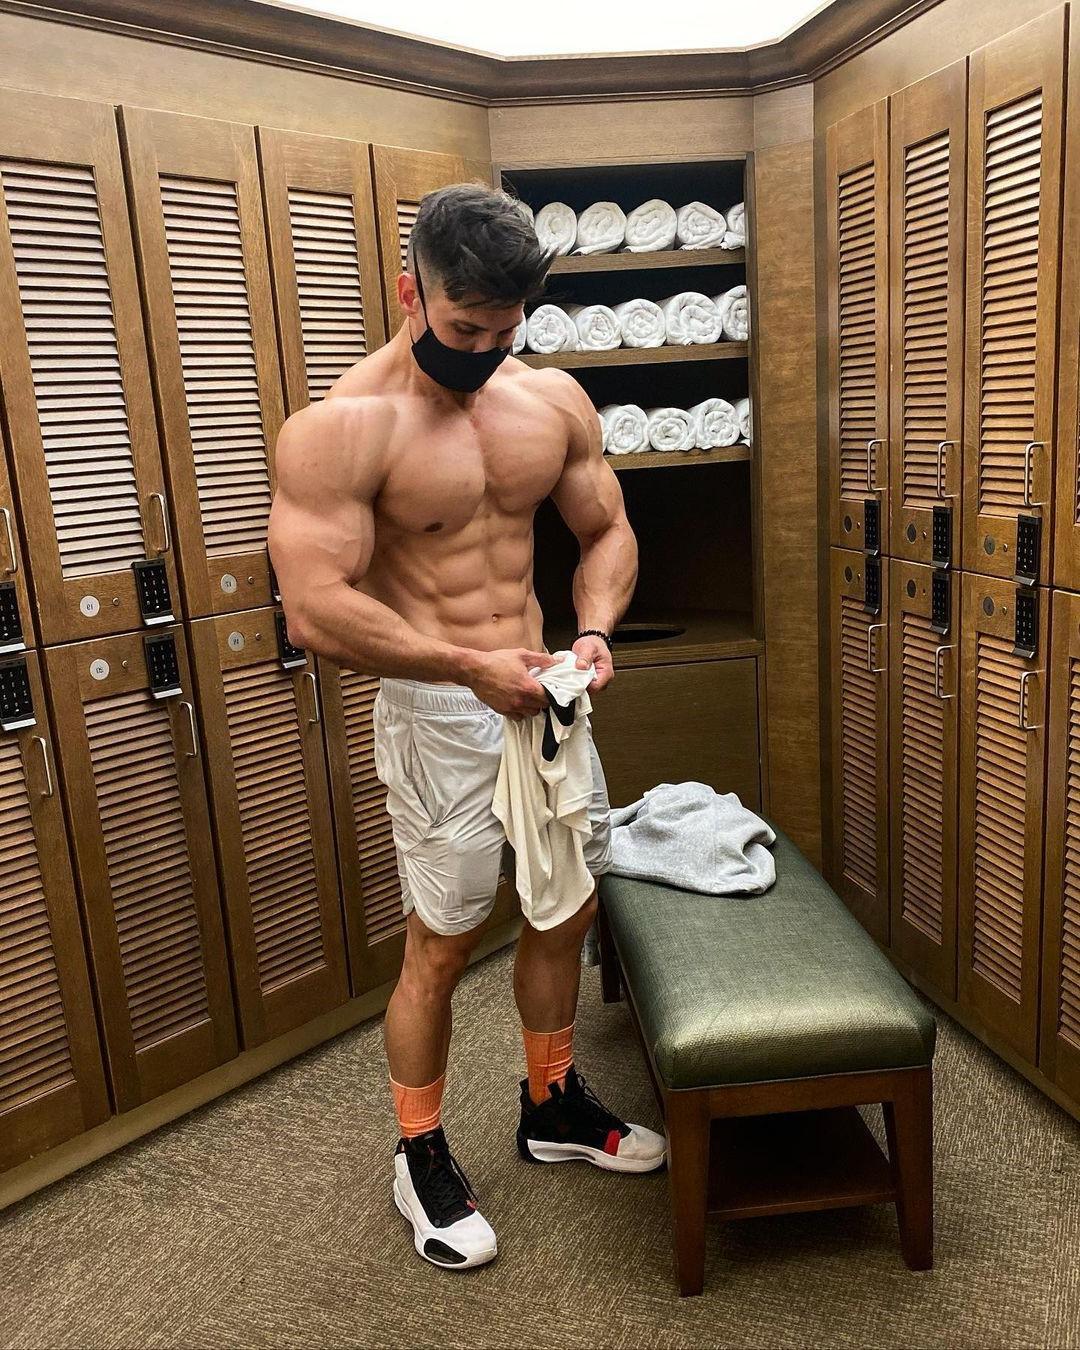 fit-masked-men-max-murillo-shirtless-muscle-biceps-hunk-locker-room